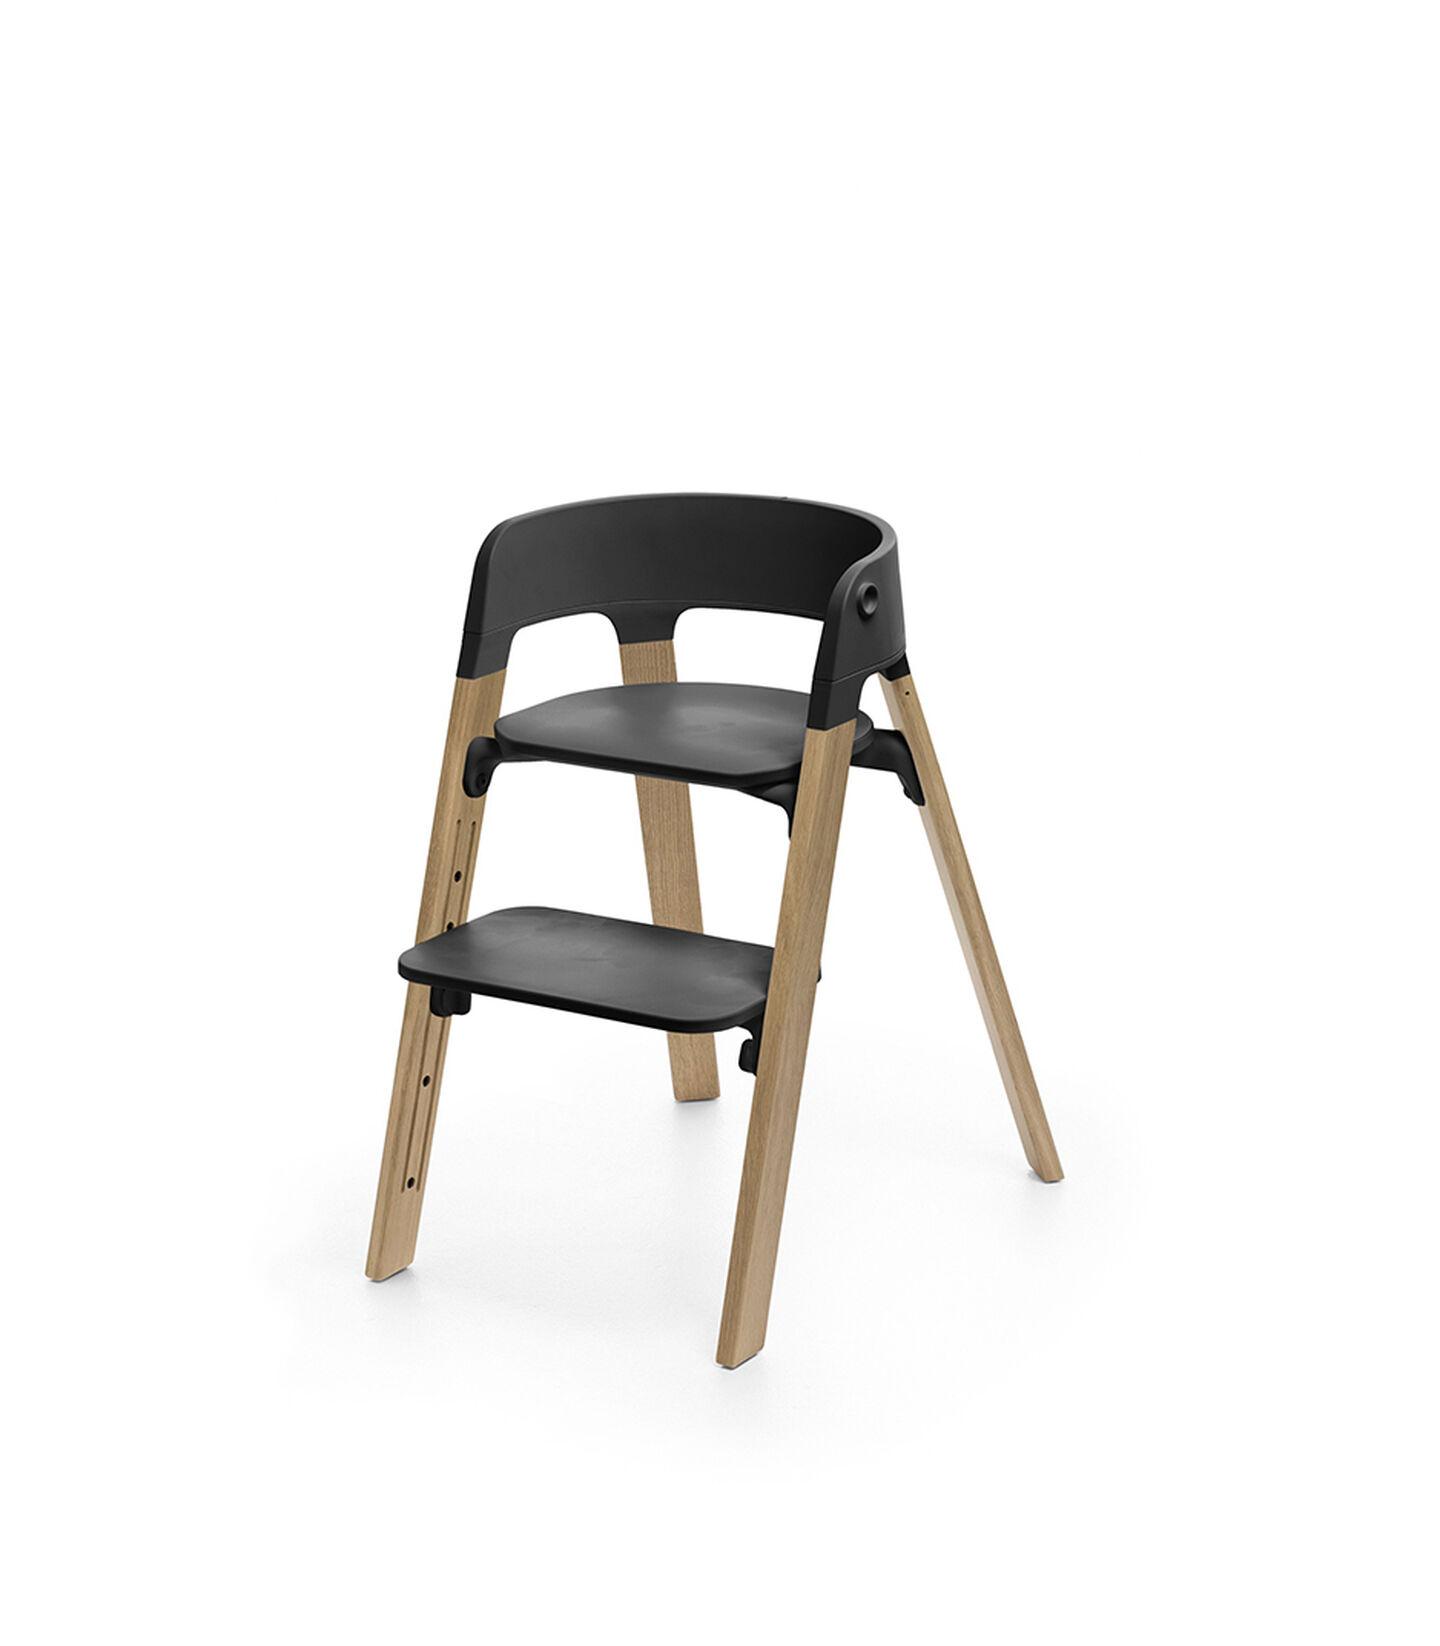 Stokke® Steps™ Chair Black Seat Oak Natural Legs, Oak Natural, mainview view 2